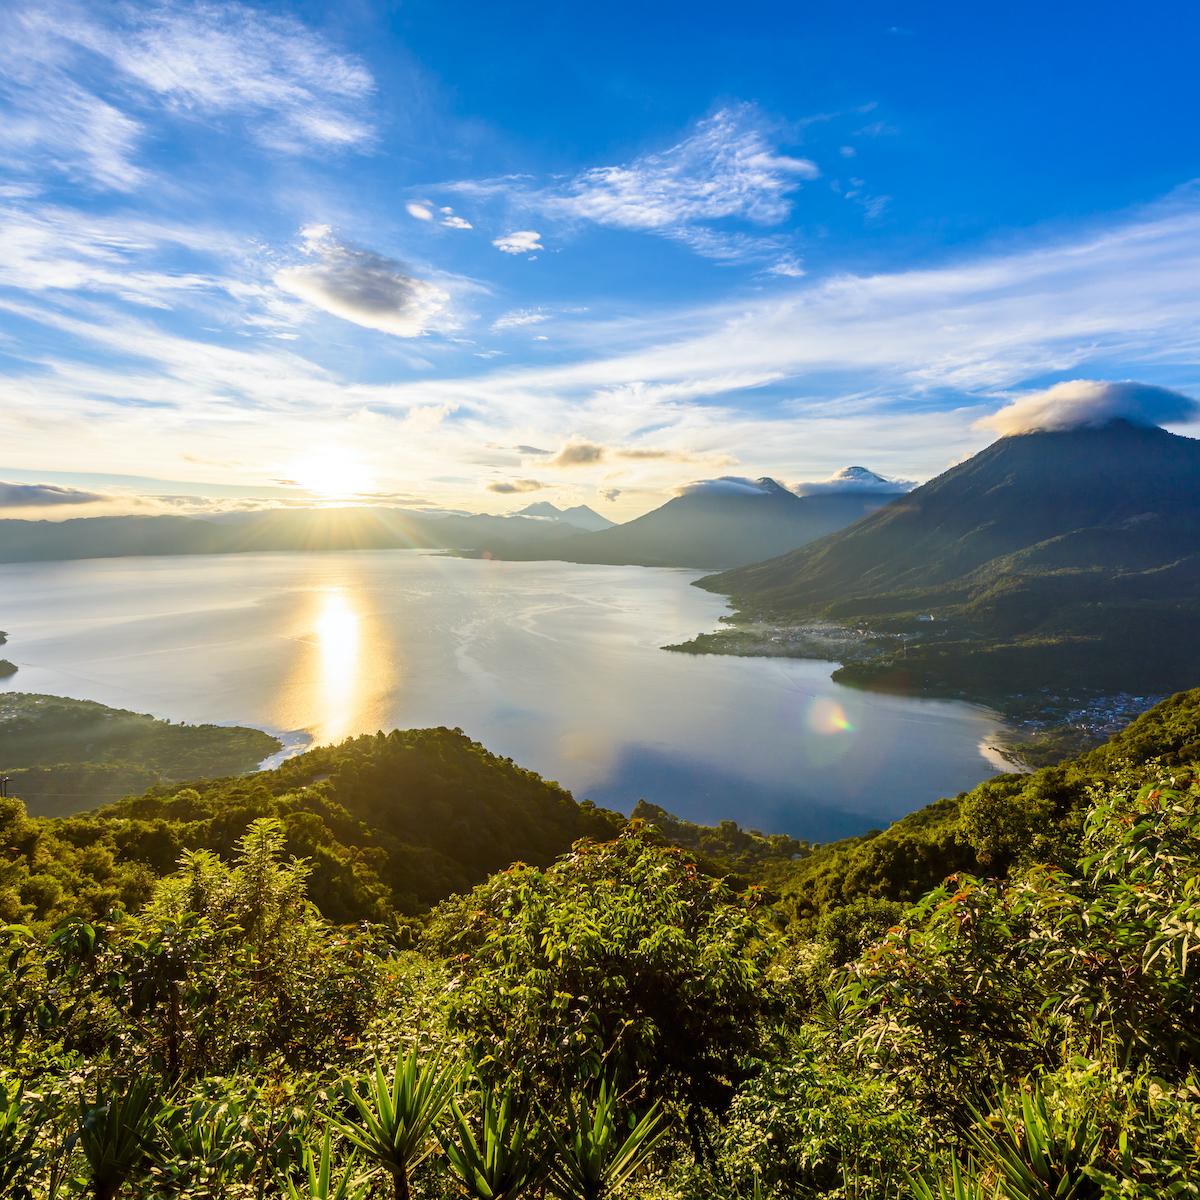 Sunrise at Lake Atitlán, Guatemala.